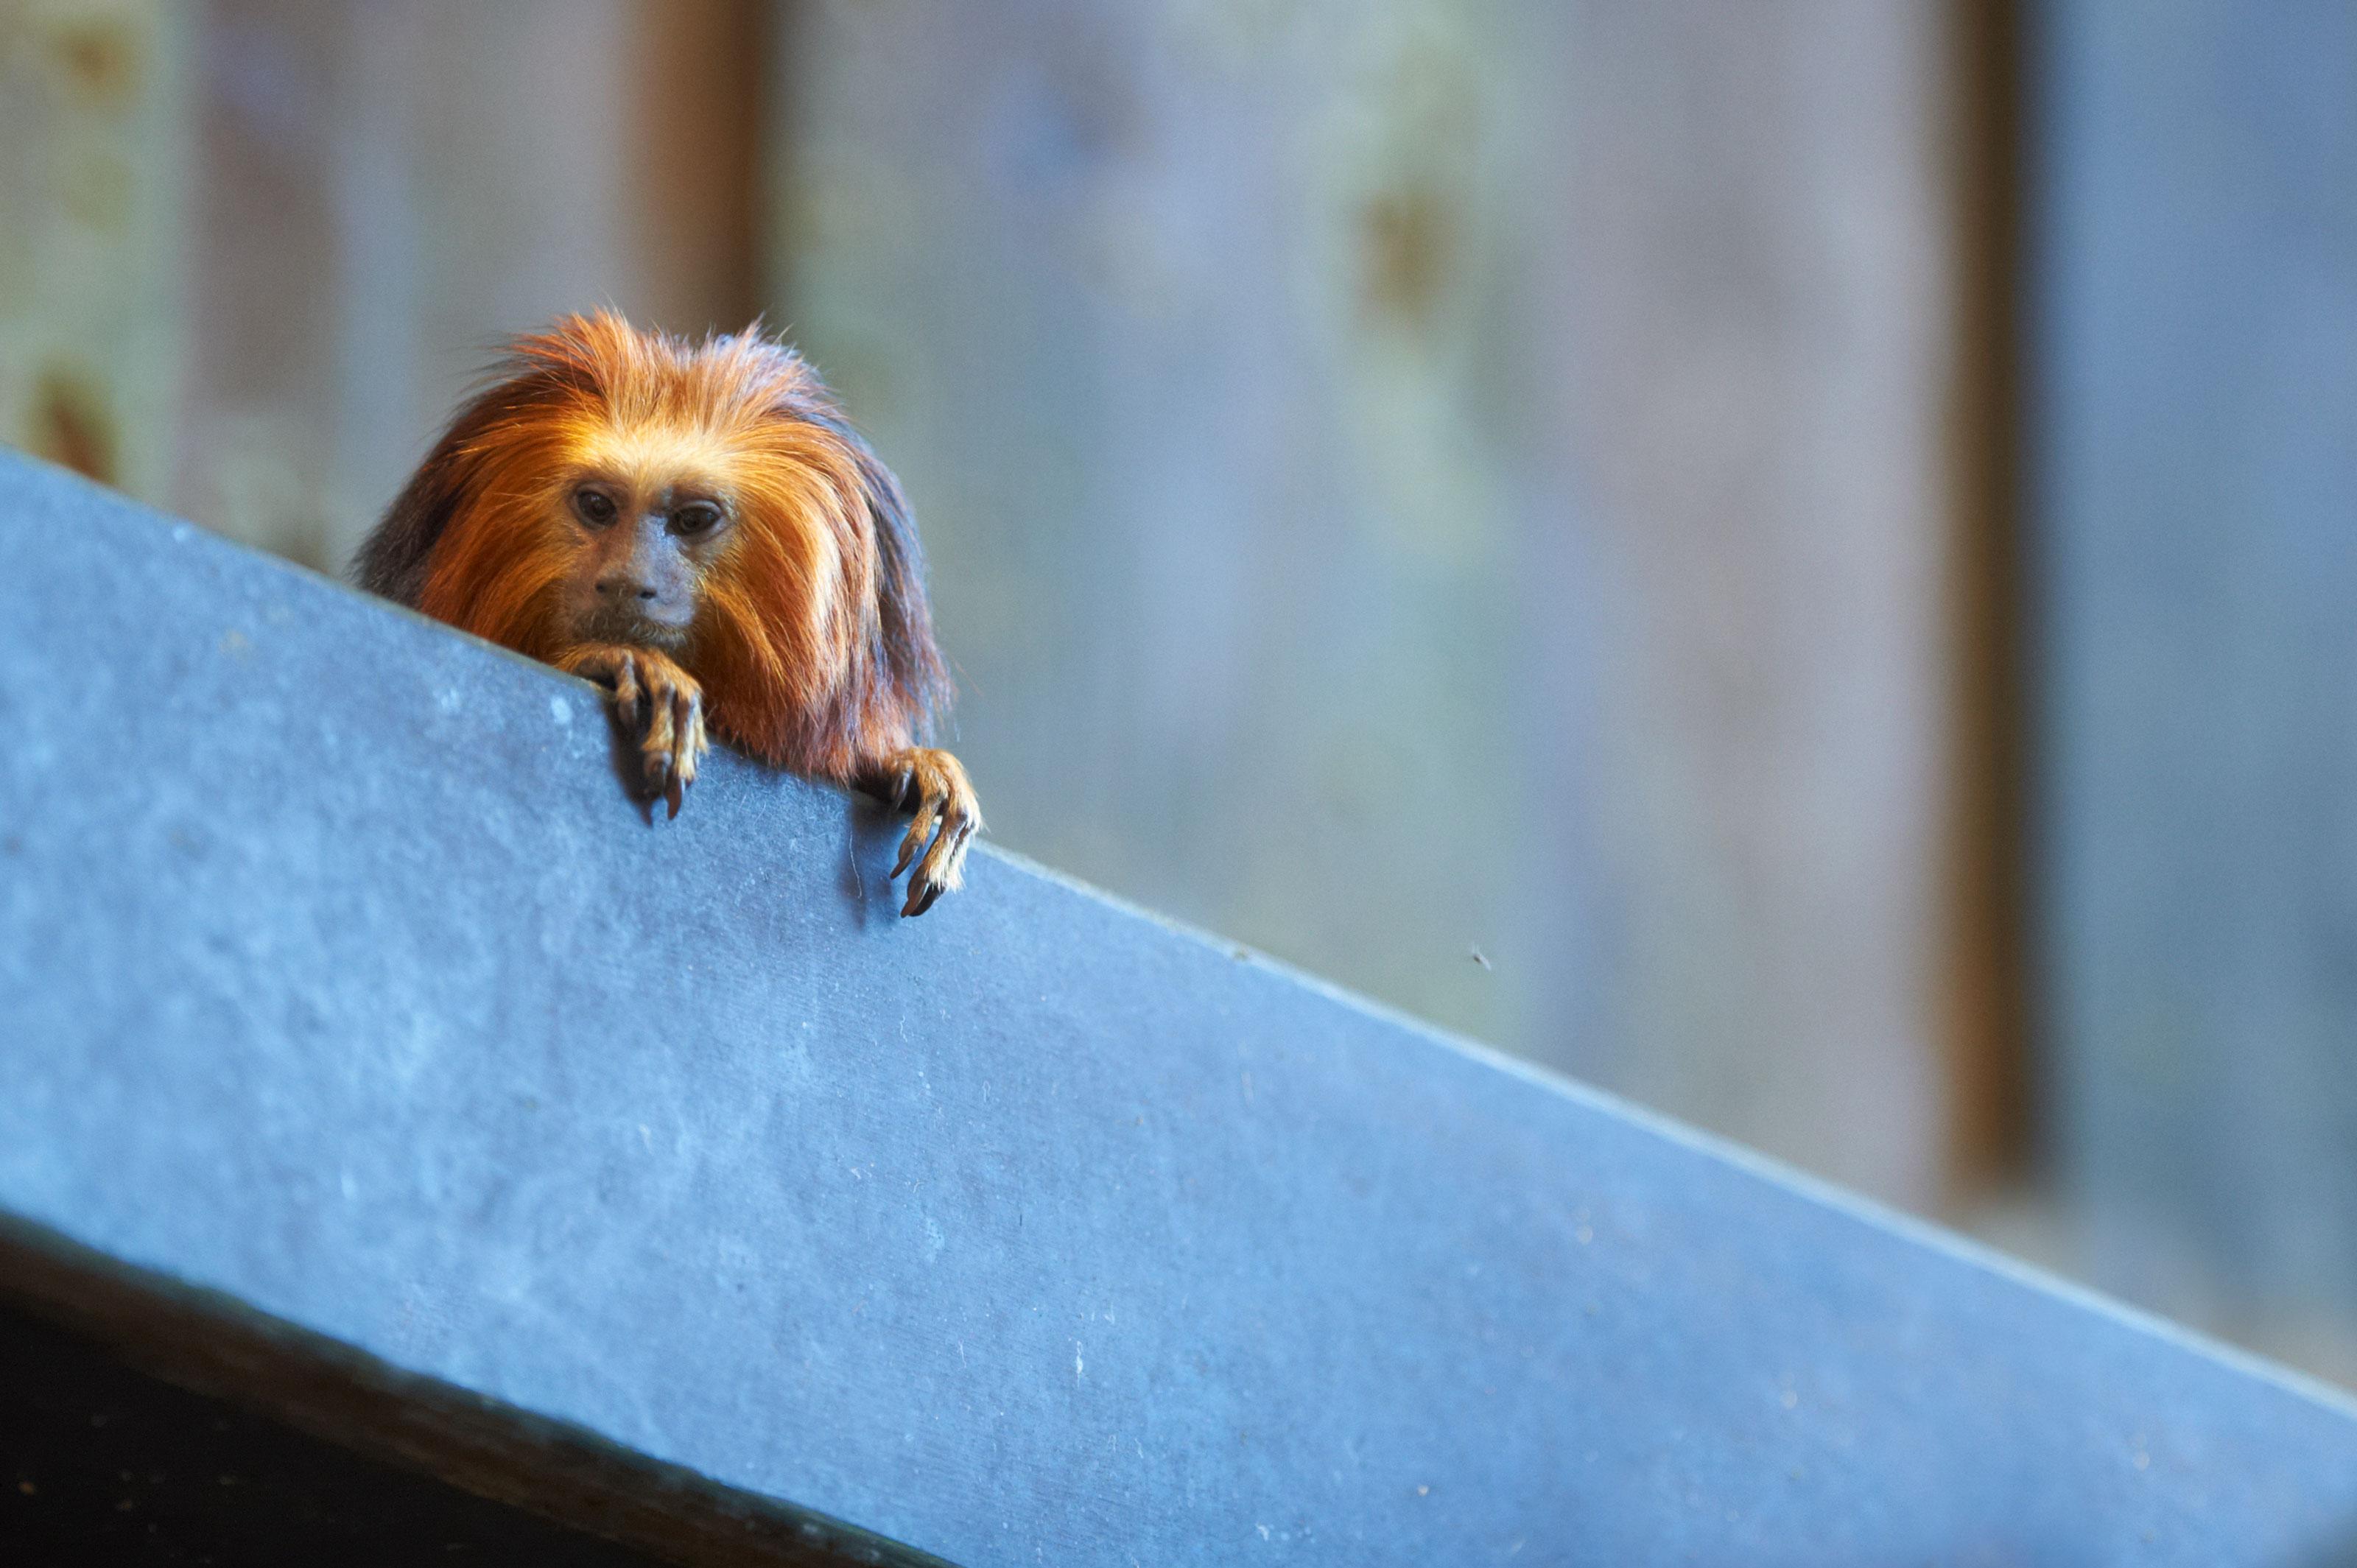 zoo Sjælland personlig assistent odense